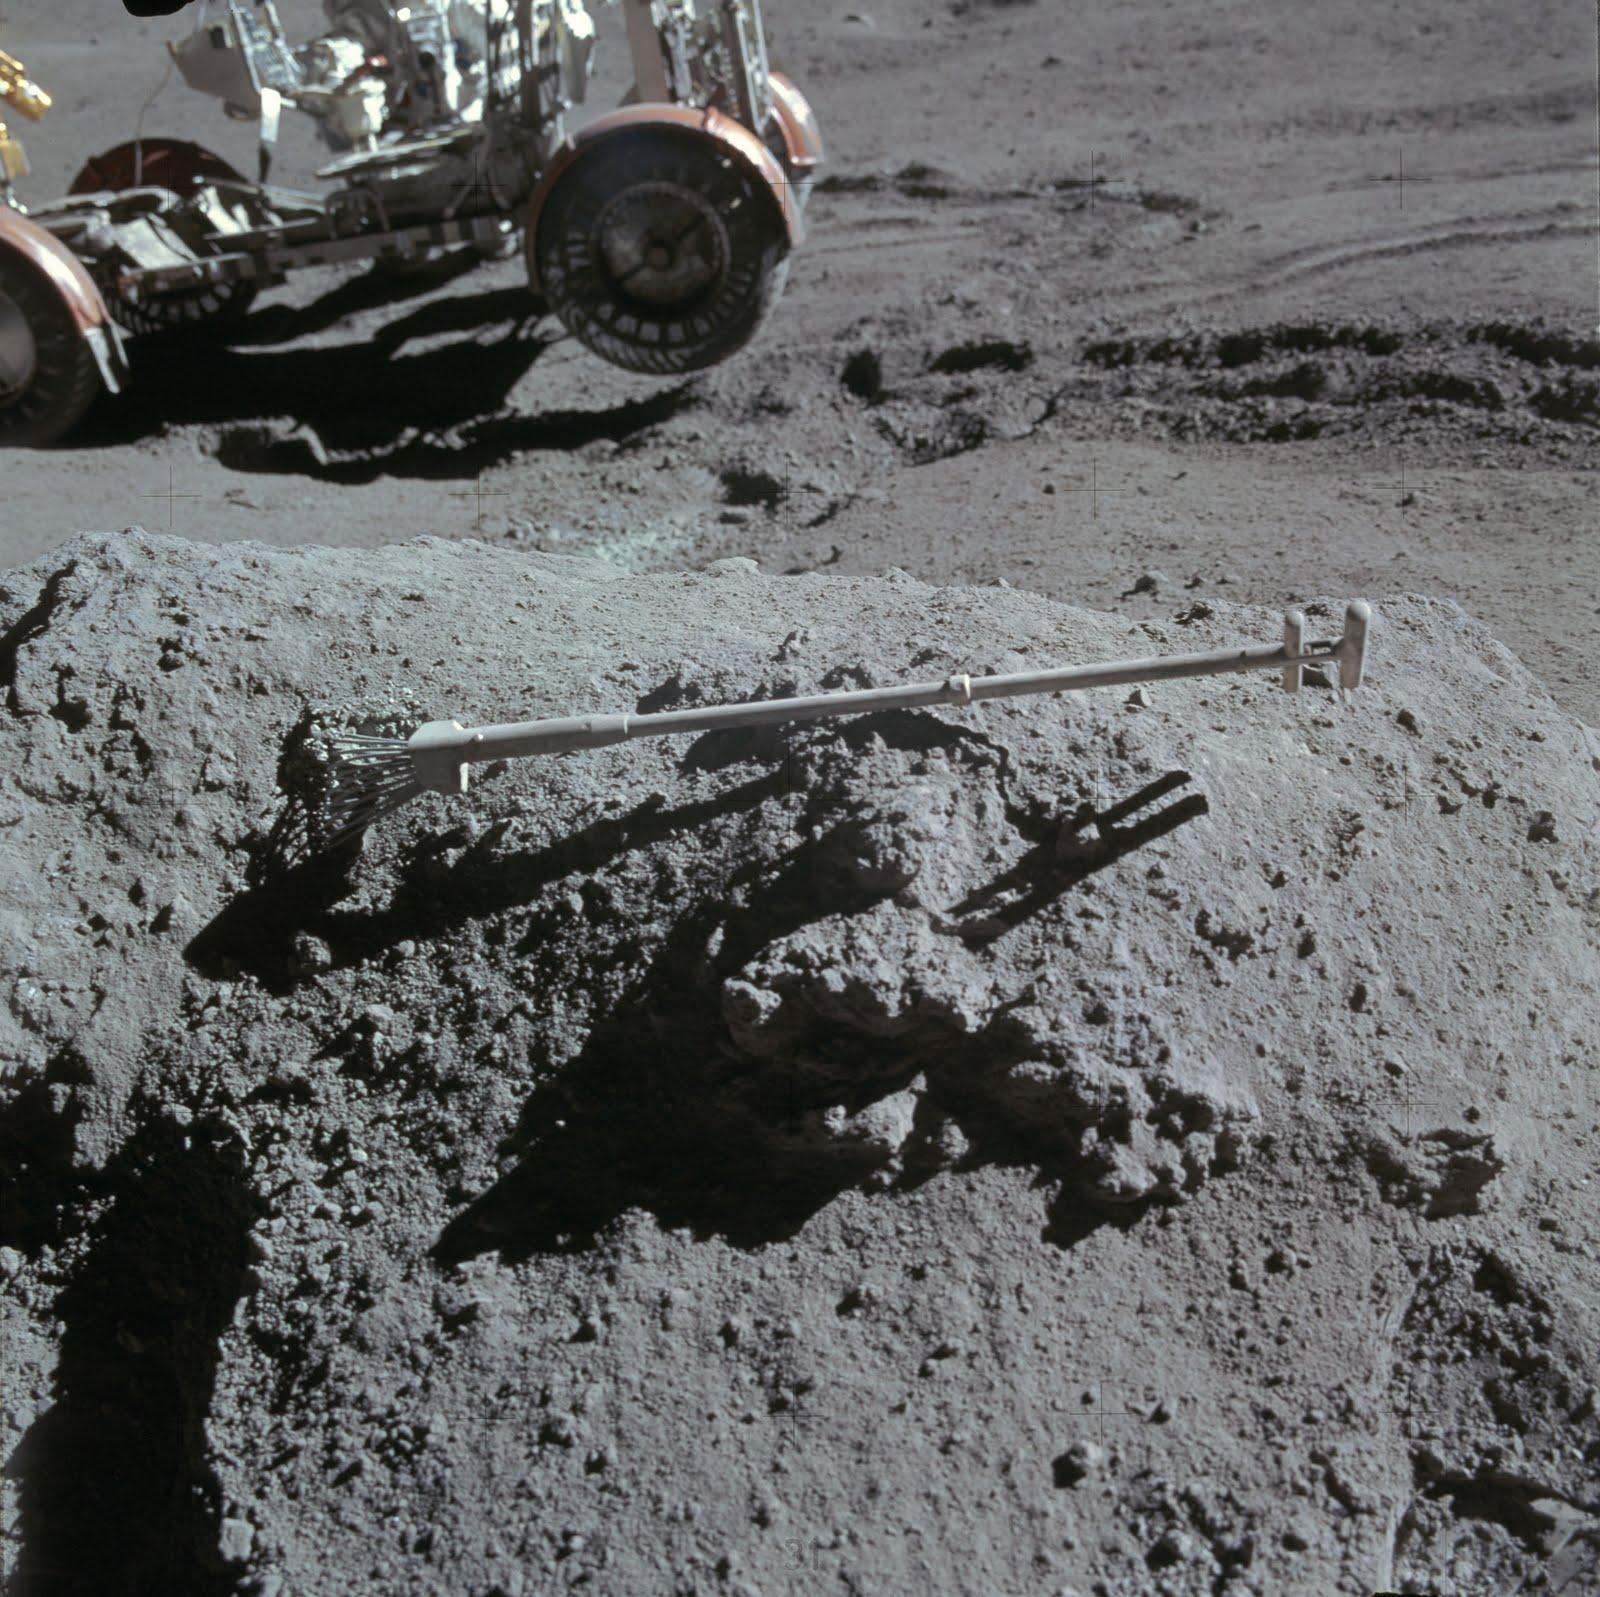 apollo tracks on moon - photo #31